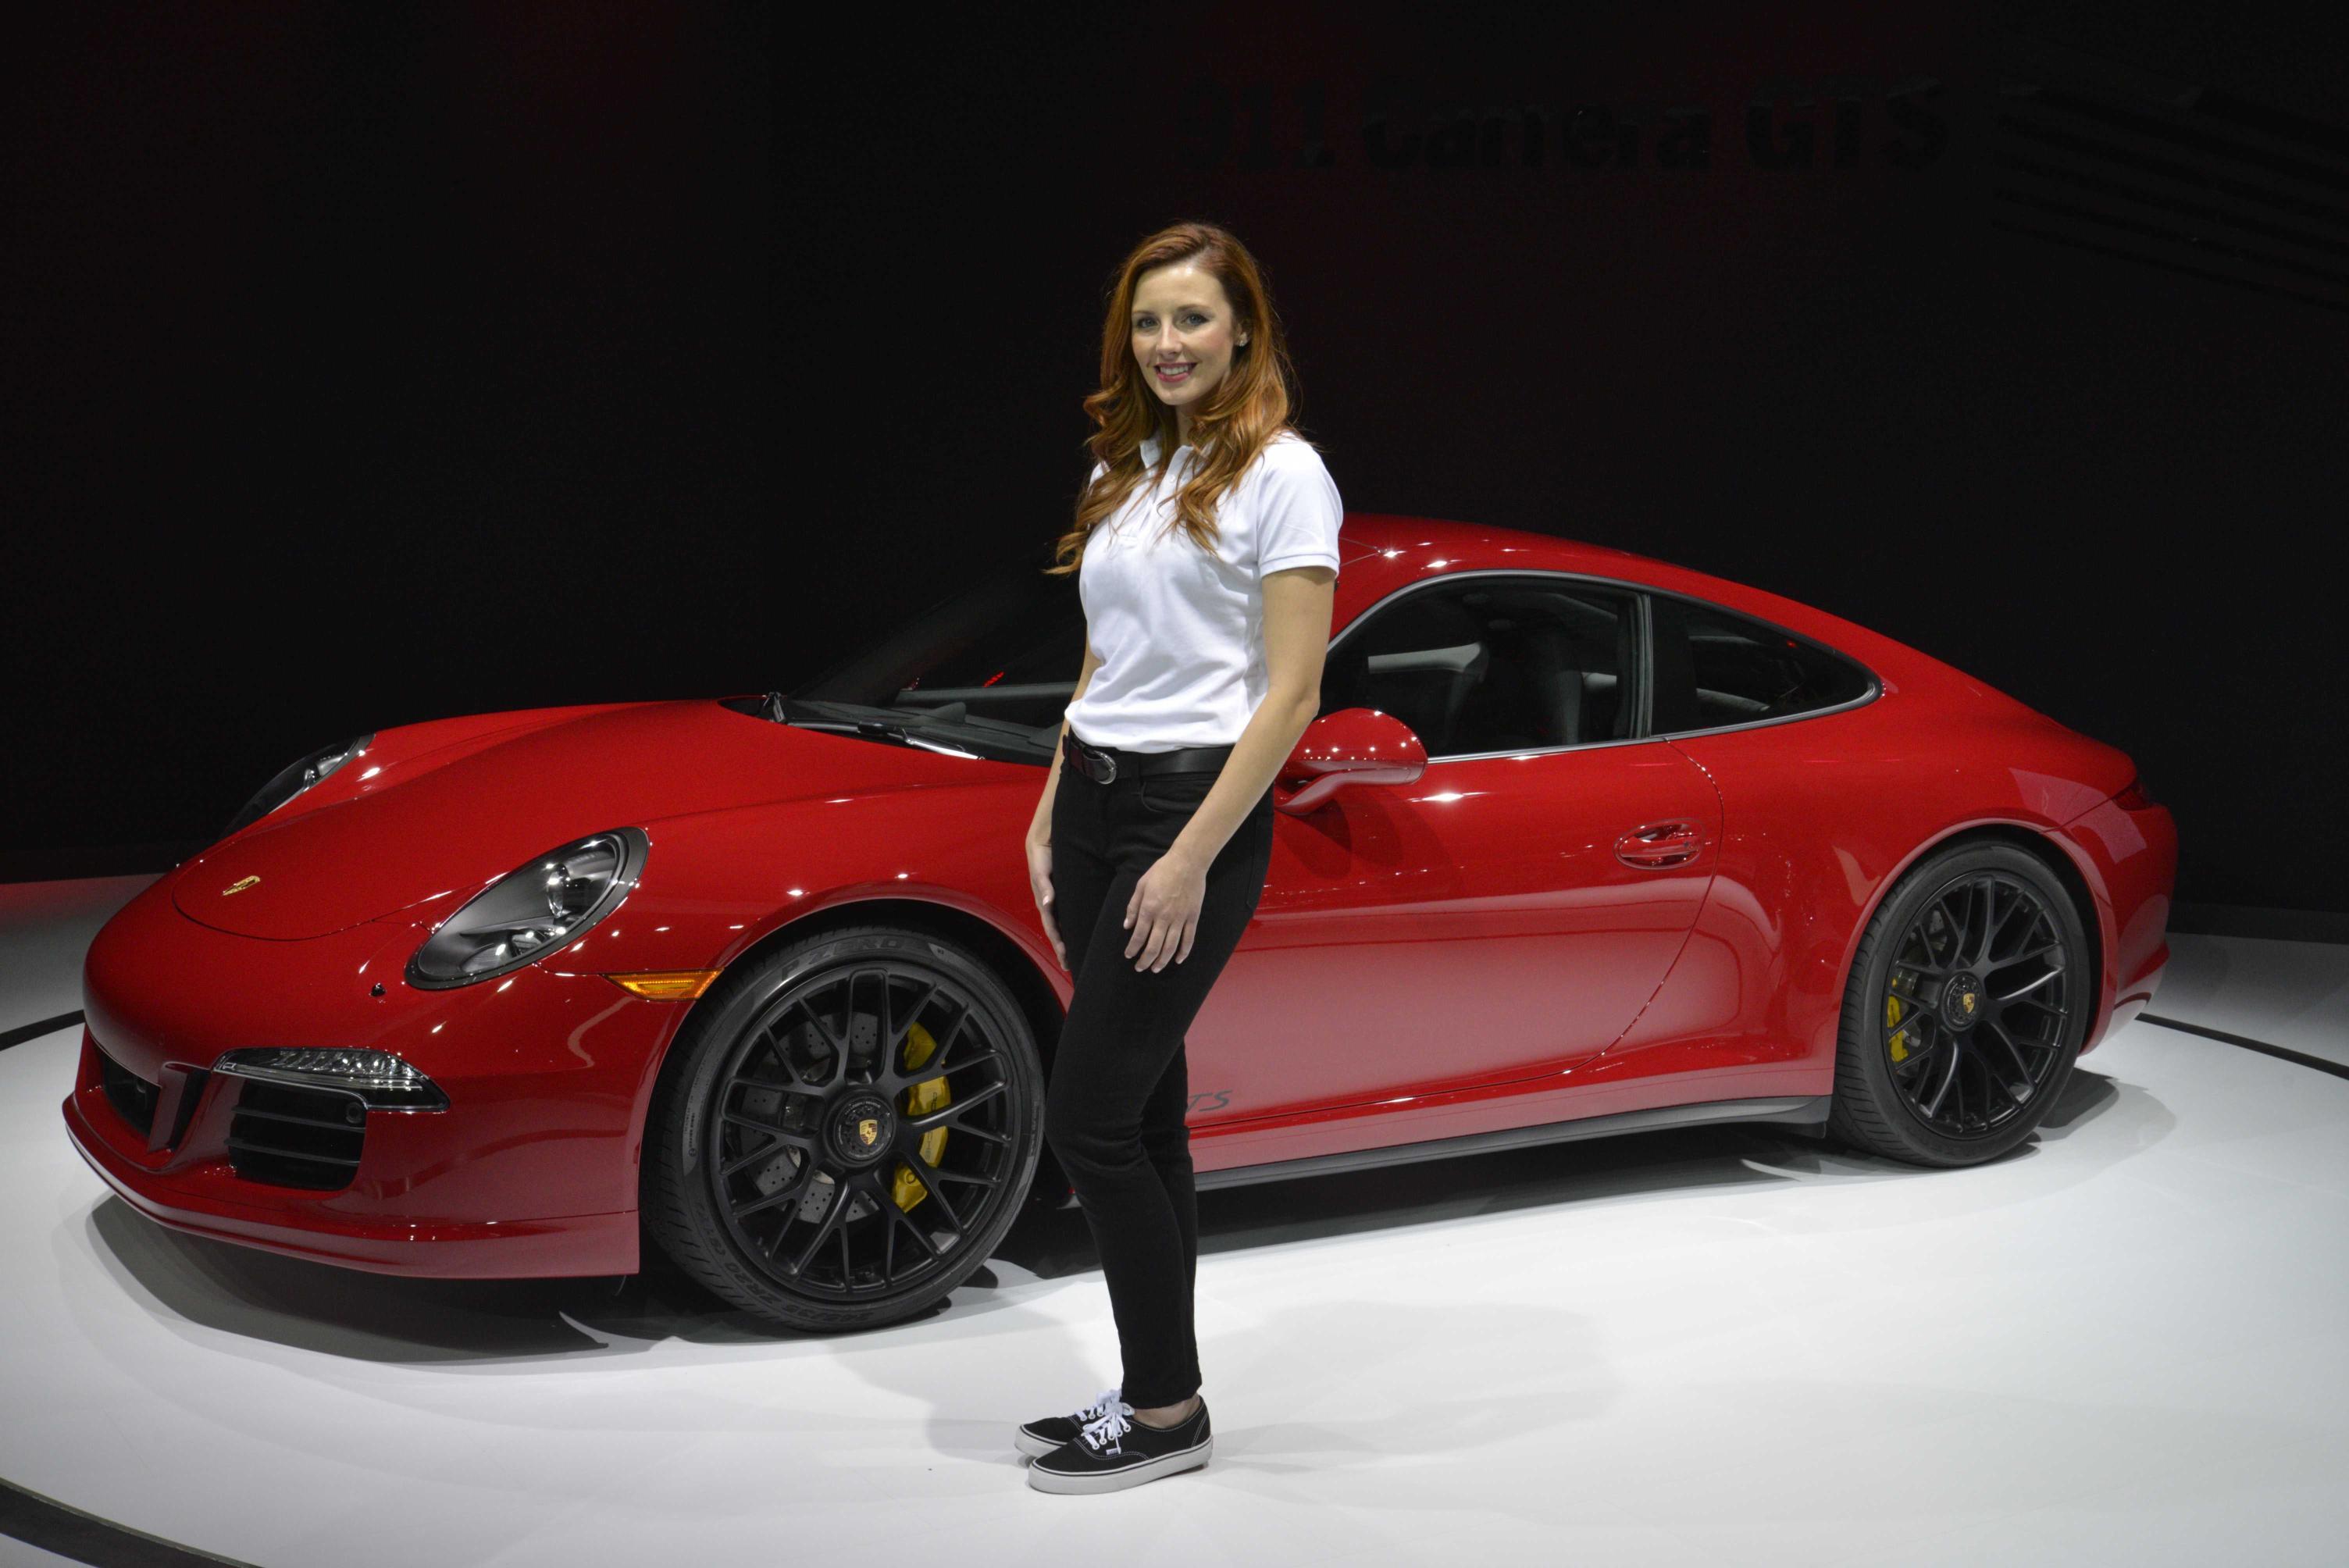 porsche carrera gt uae html with 2015 Porsche 911 Carrera Gts Revealed on Red Porsche together with Porsche Stinger Price besides Ferrari Wallpapers Hd additionally 2014 Nissan Gt R 166289 moreover Porsche 2015 Price In Uae Auto Car Specs.